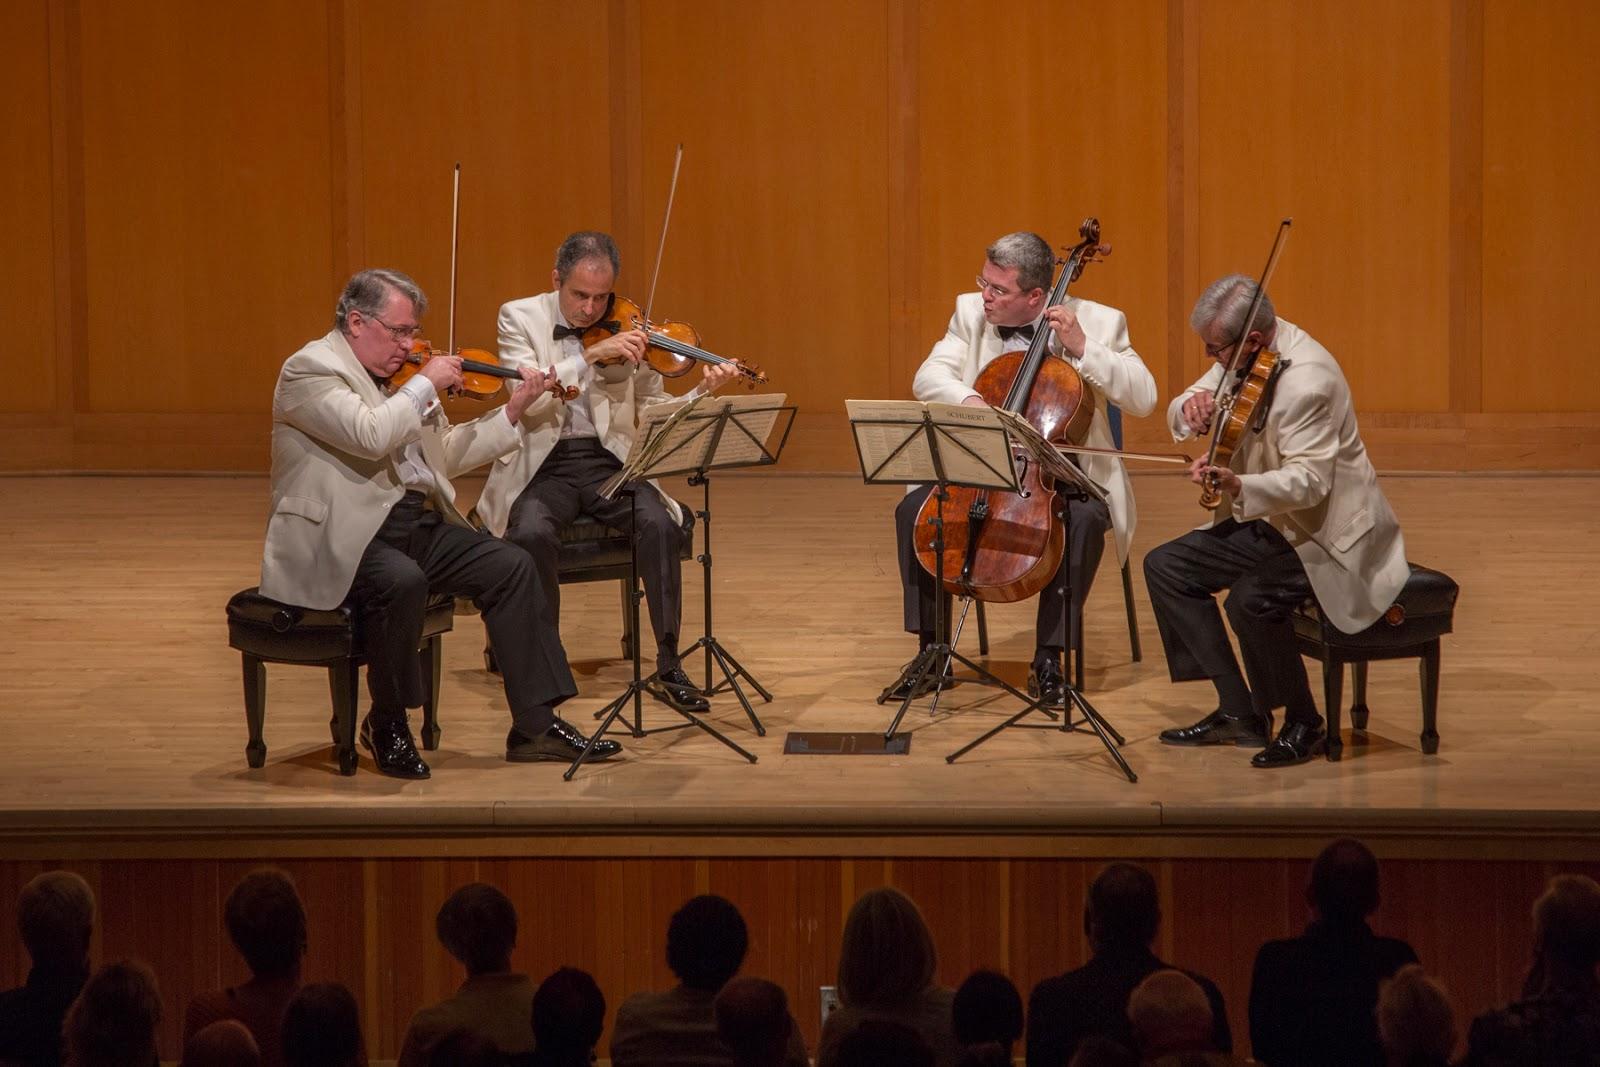 Northwest Reverb: Emerson String Quartet with cellist Paul Watkins